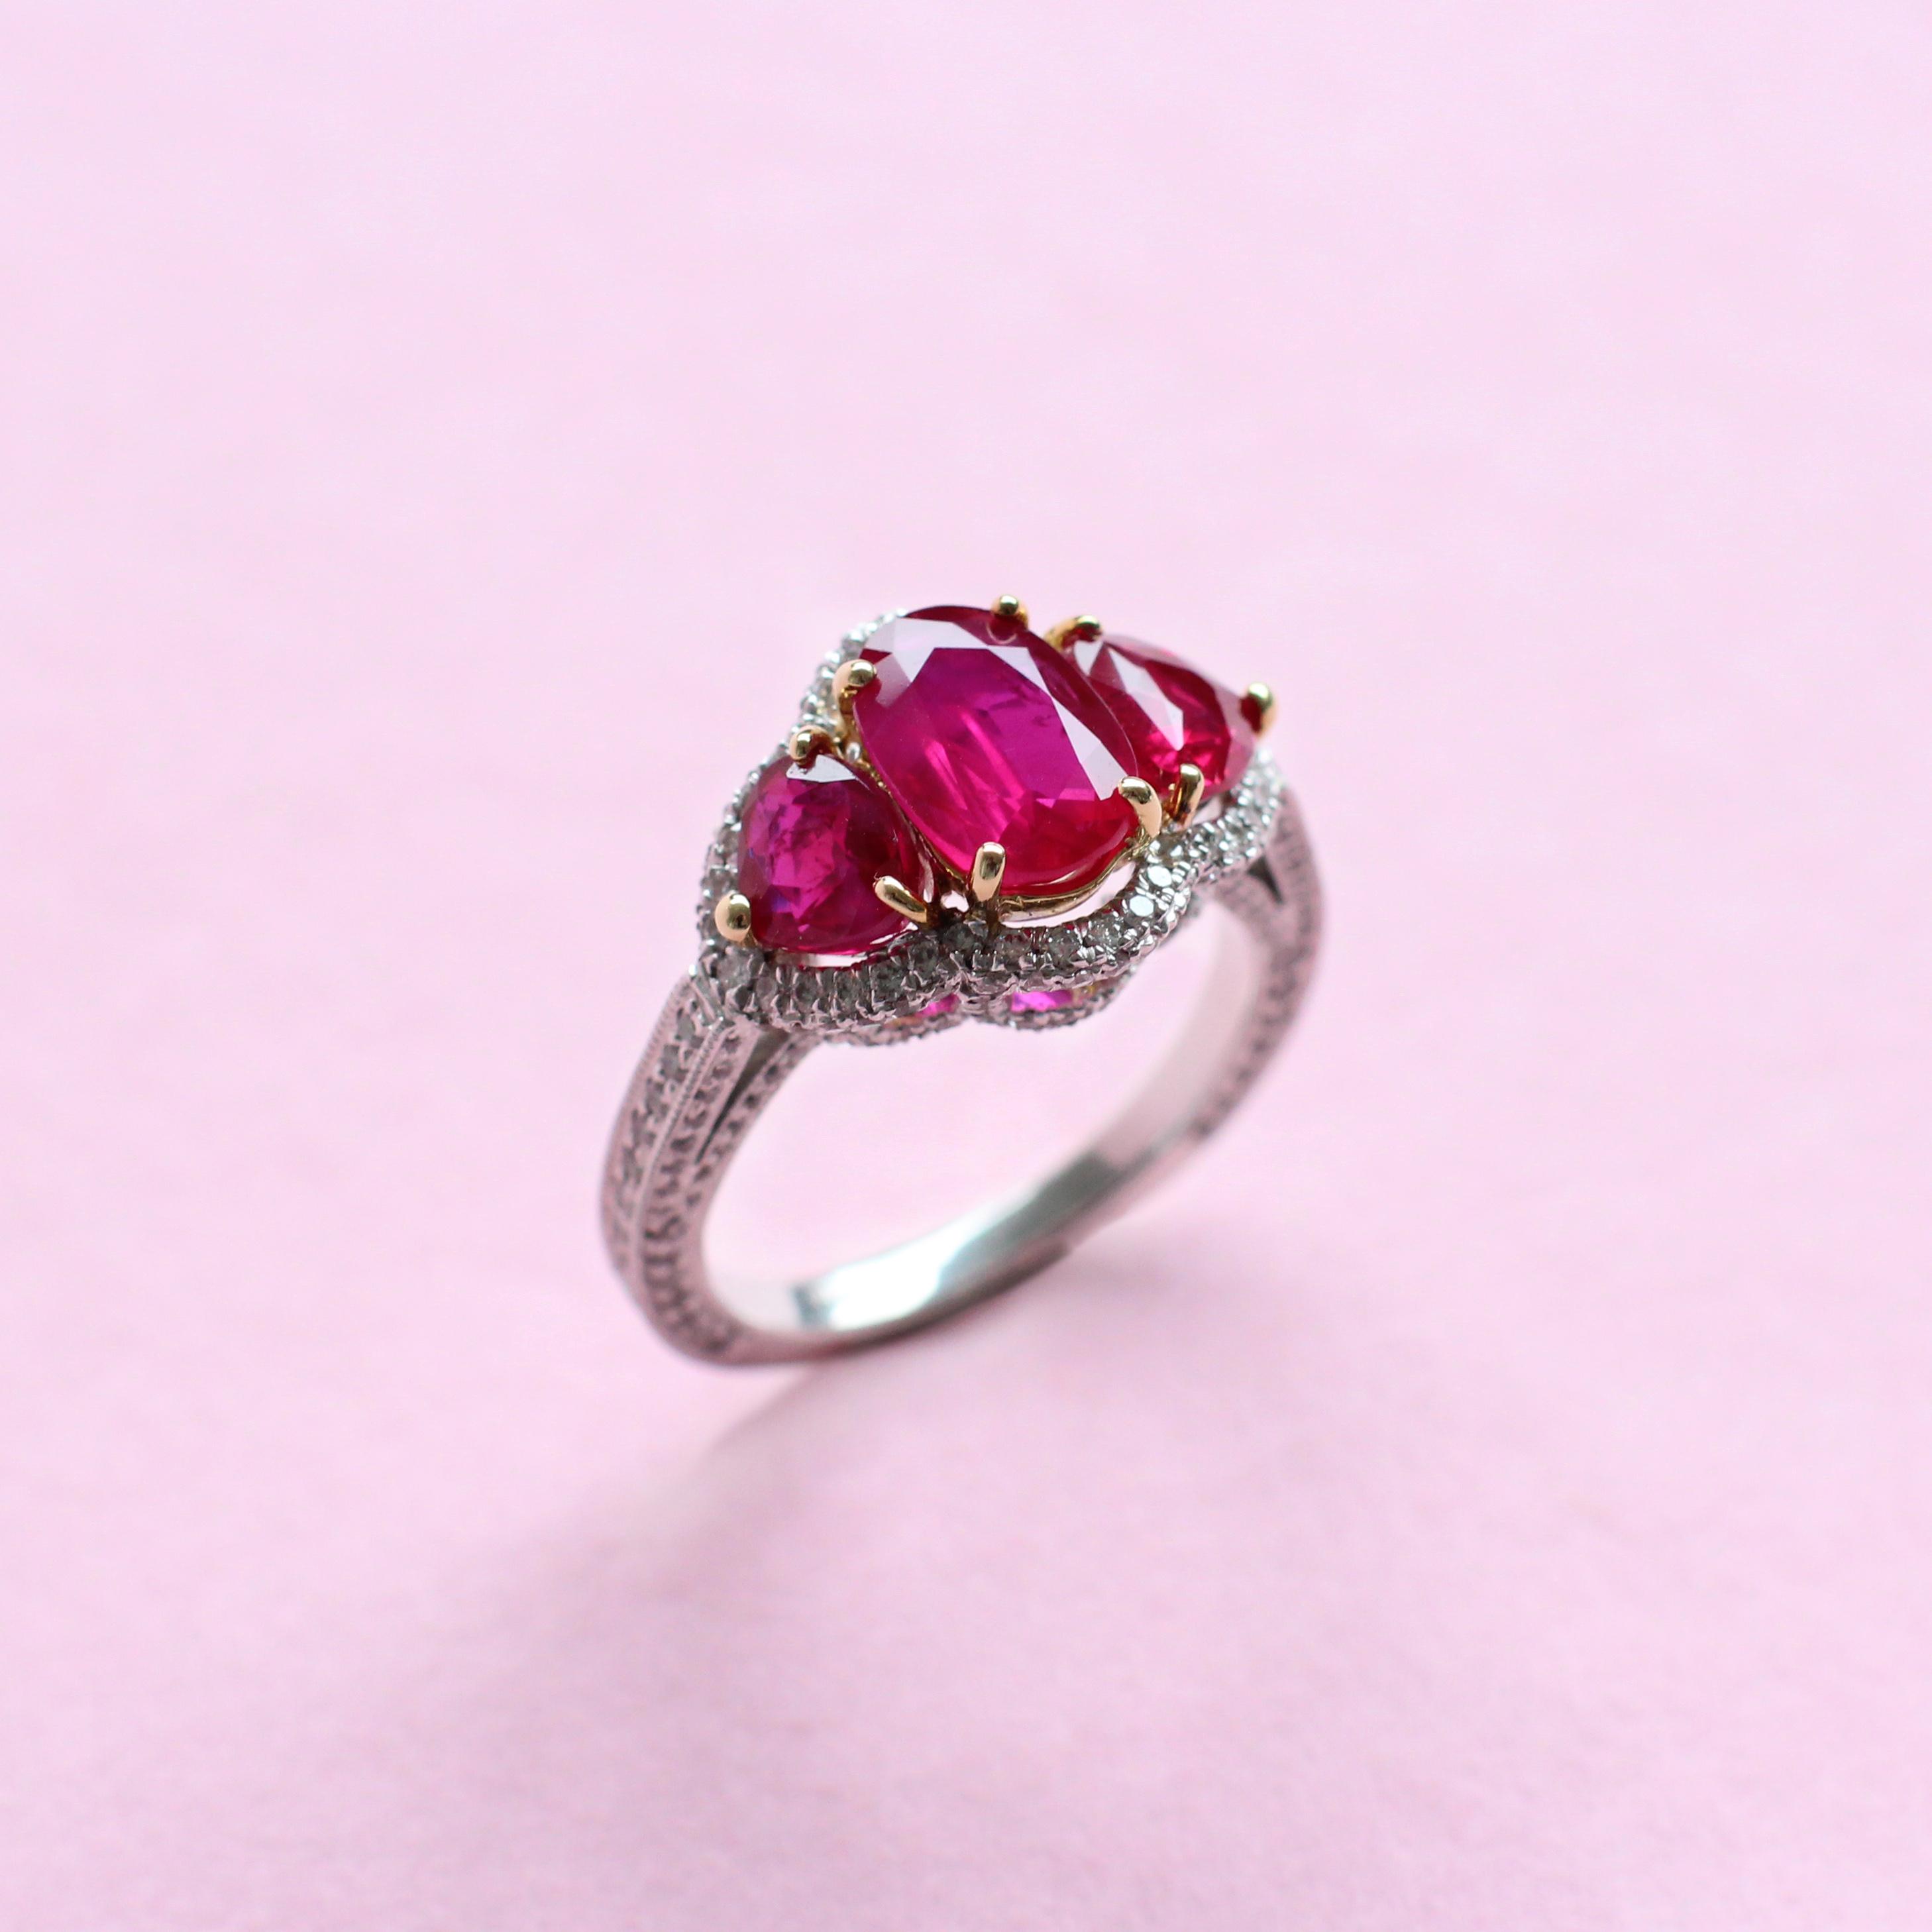 ruby three stone ring with white diamond surround